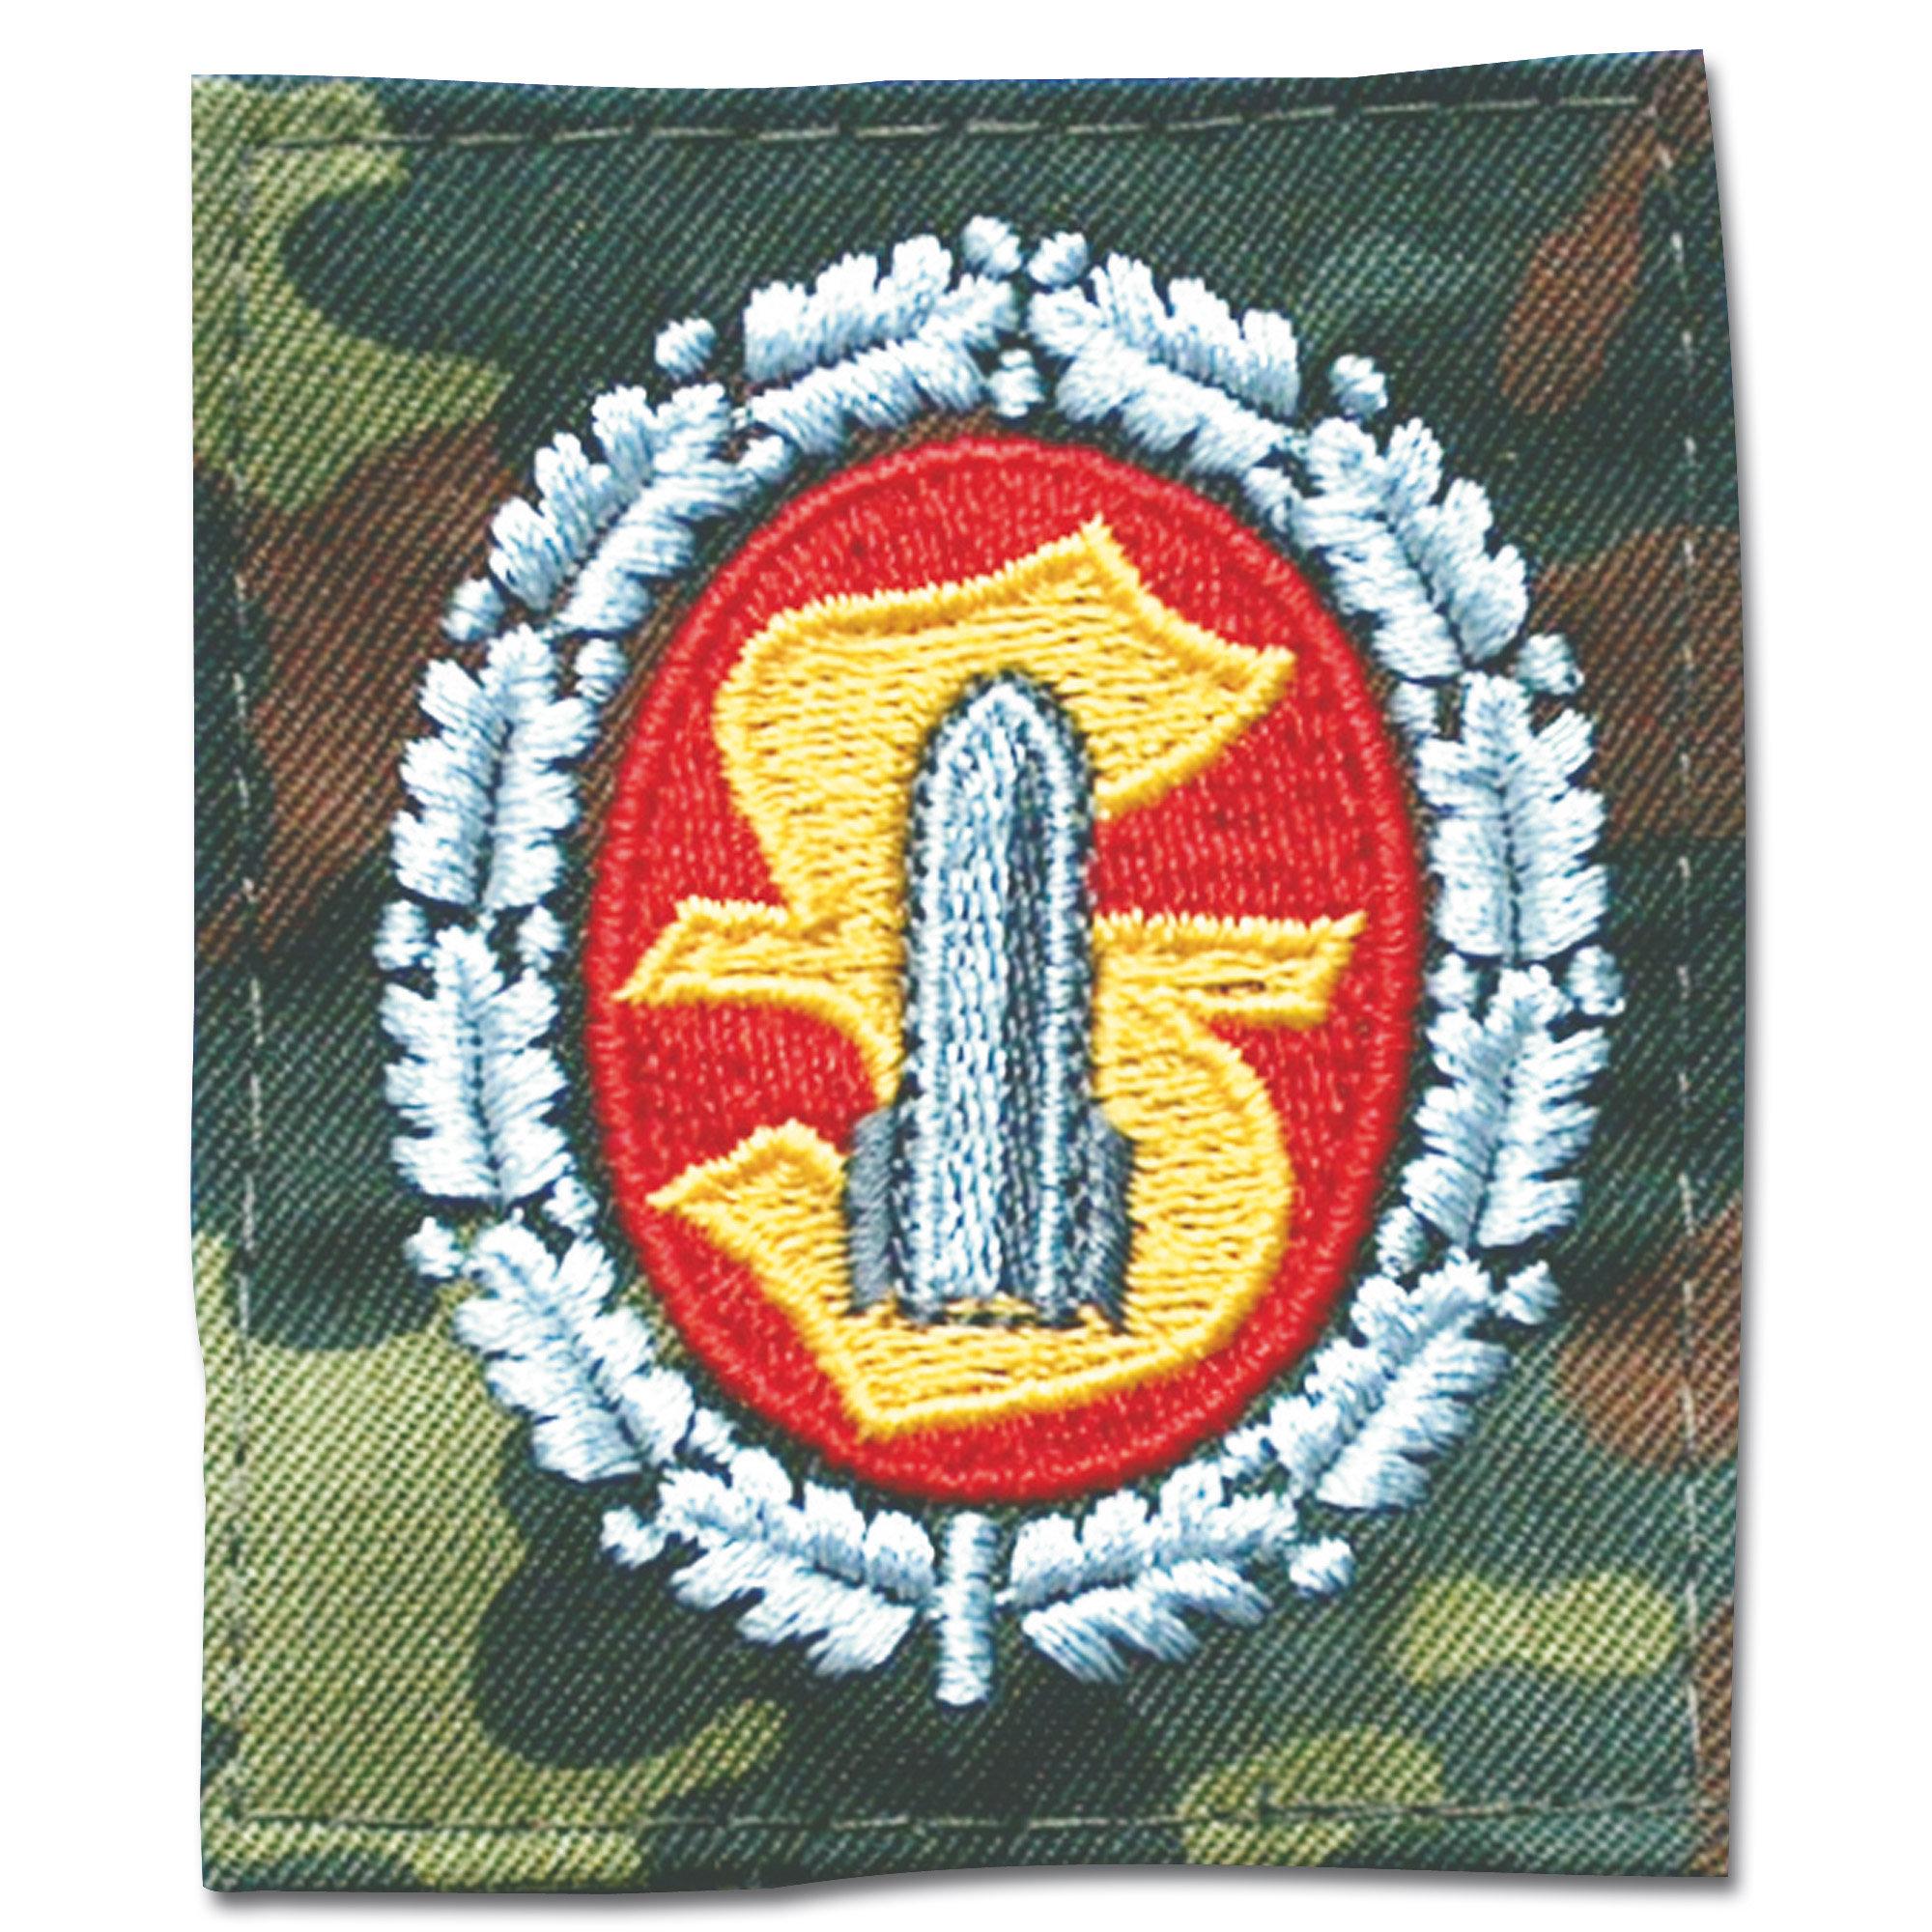 insignia cloth Mun-Personal flecktarn/bunt